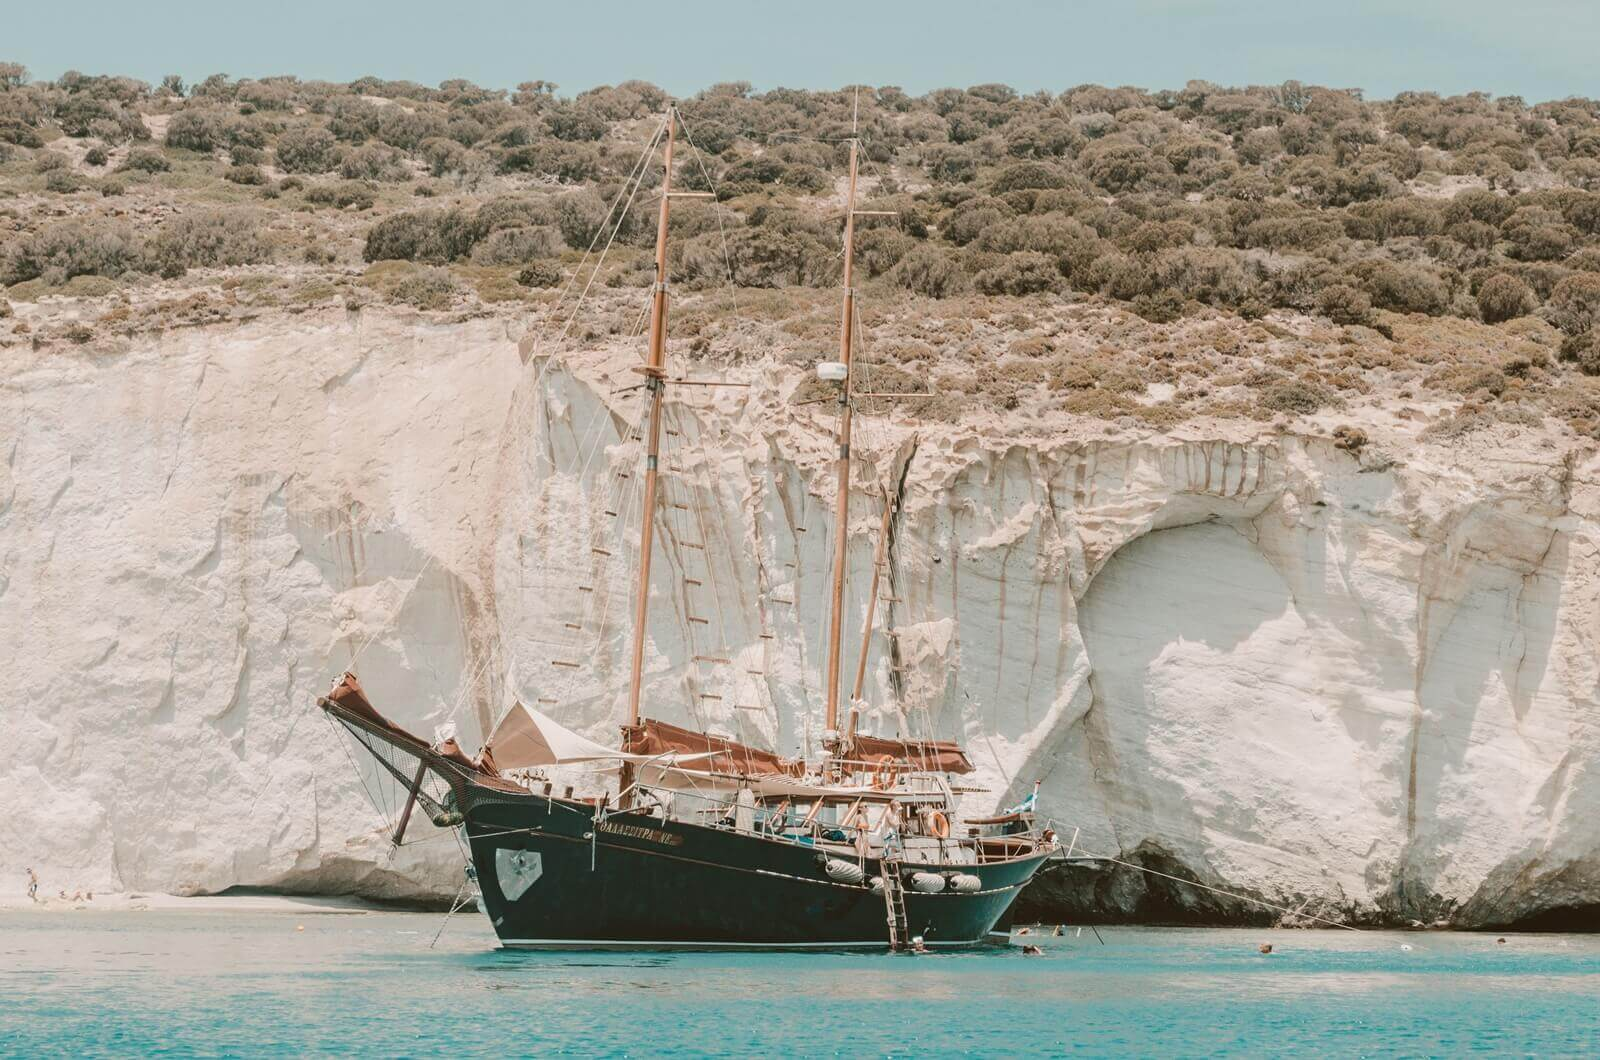 milos-greece-la-vie-en-blog-all-rights-reserved11